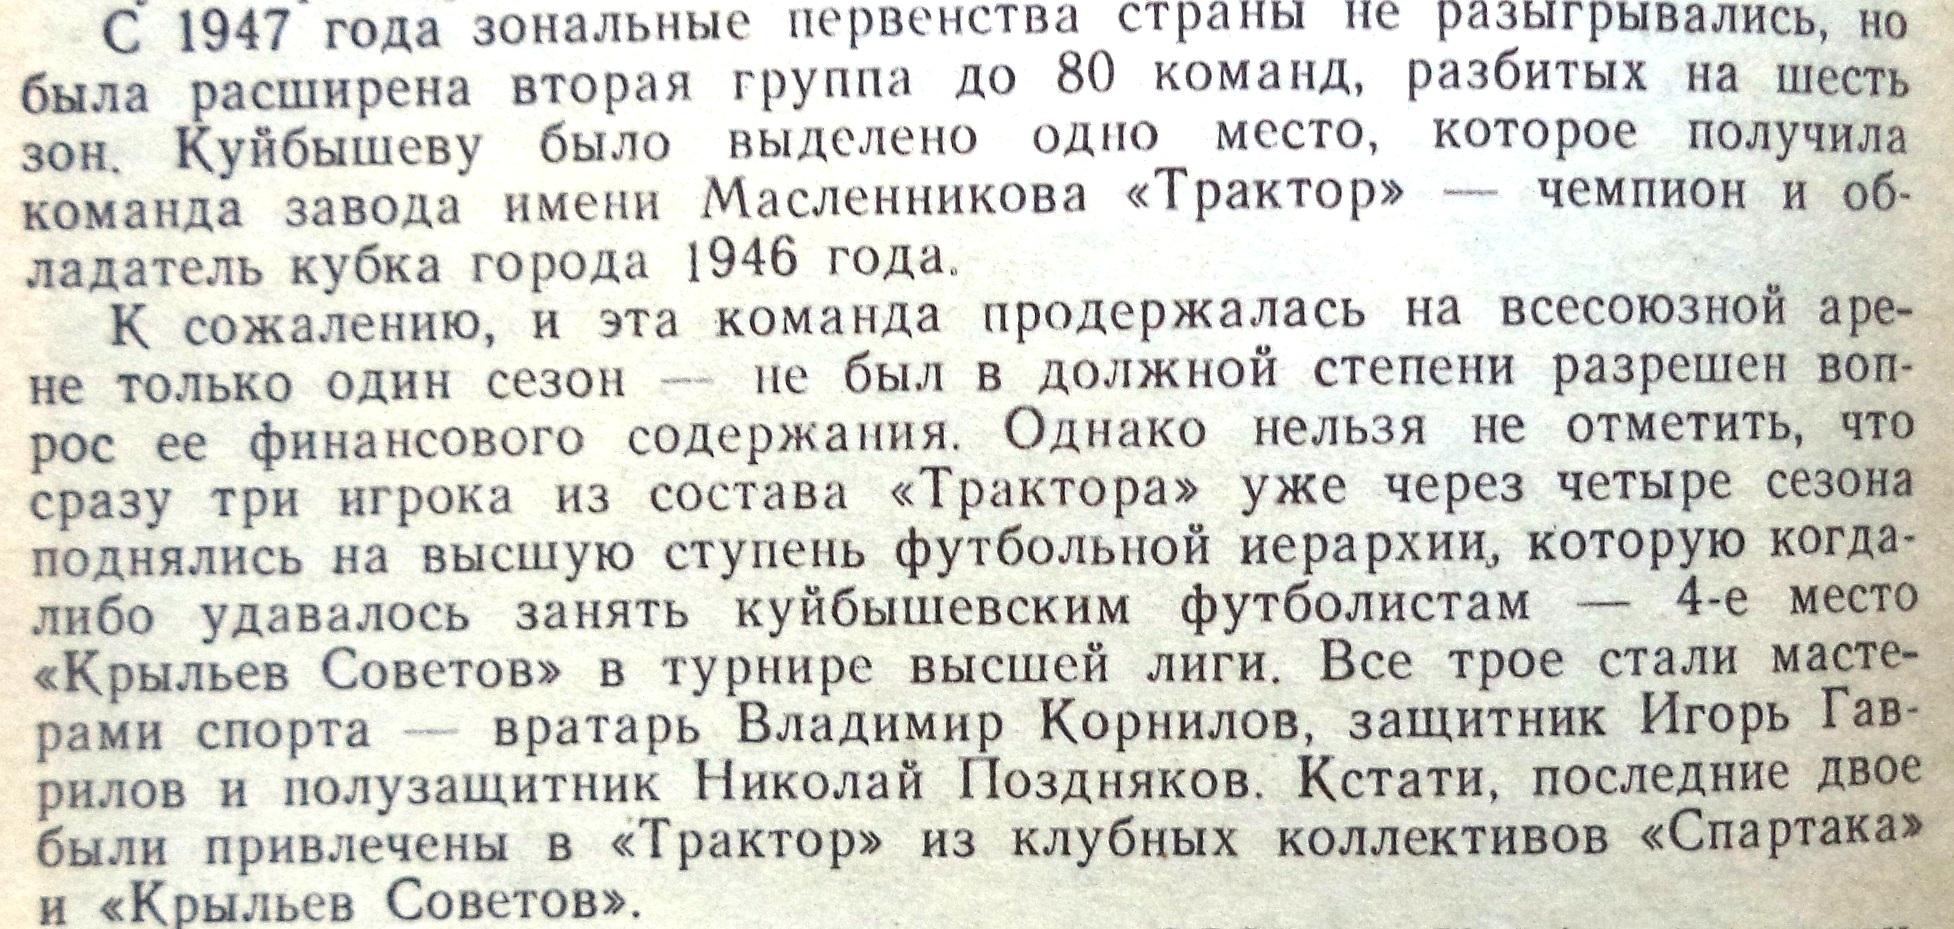 ФОТО-Масленникова-06-Трактор